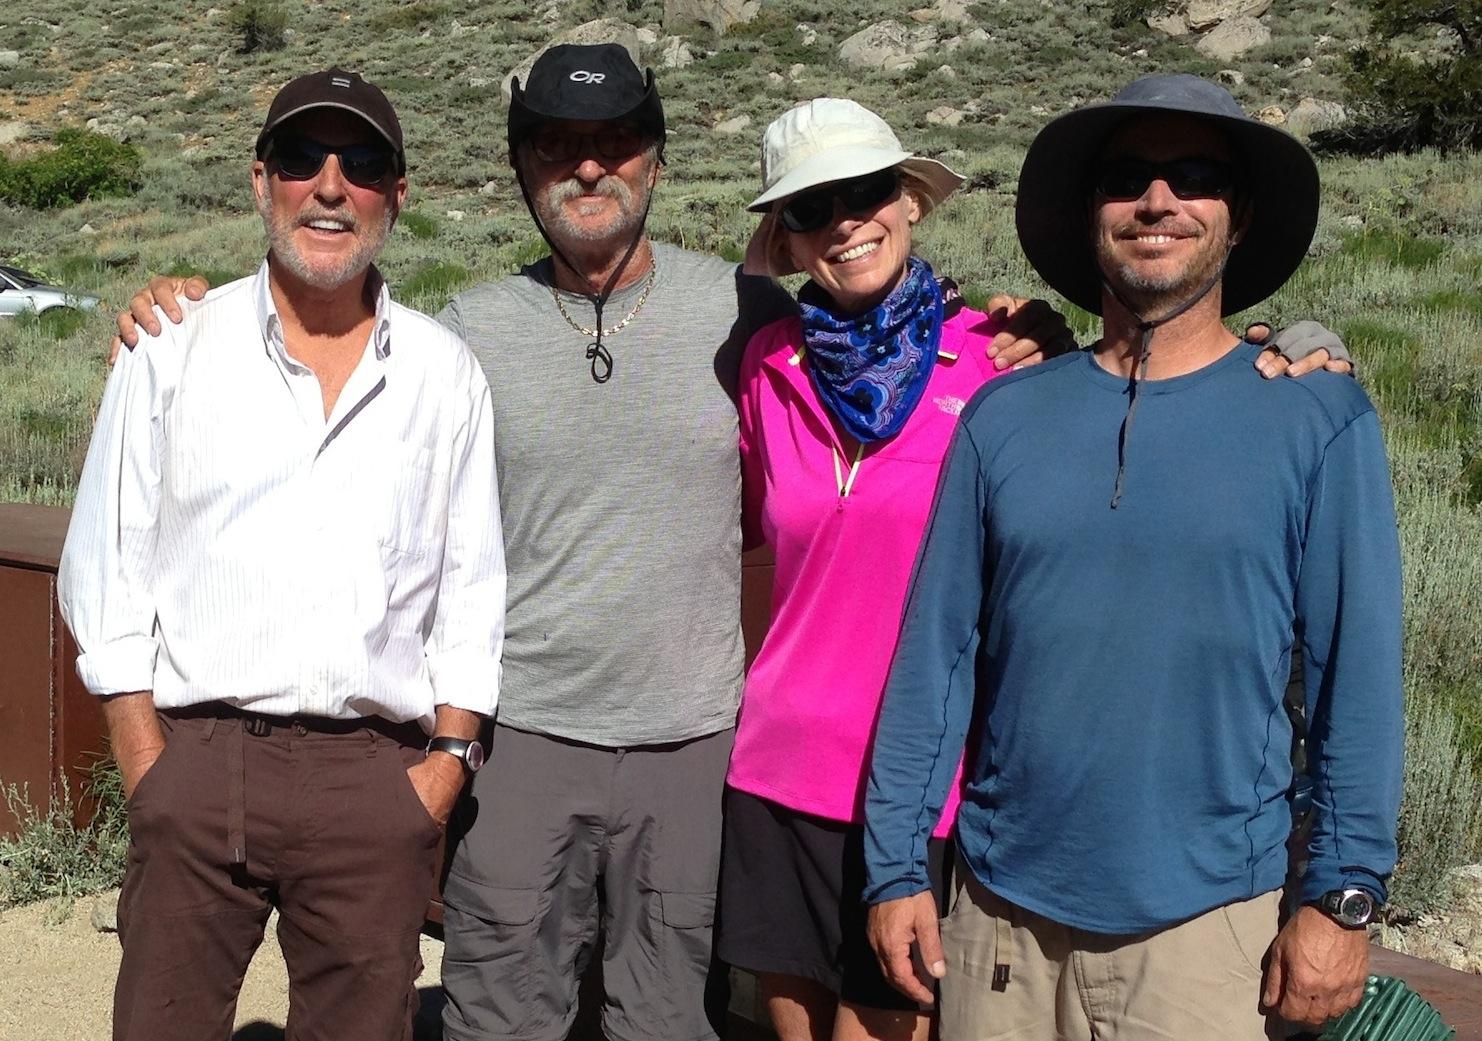 Strider with JMT nobo Santa Cruz (Glenn, Mark and Mike) on July 3